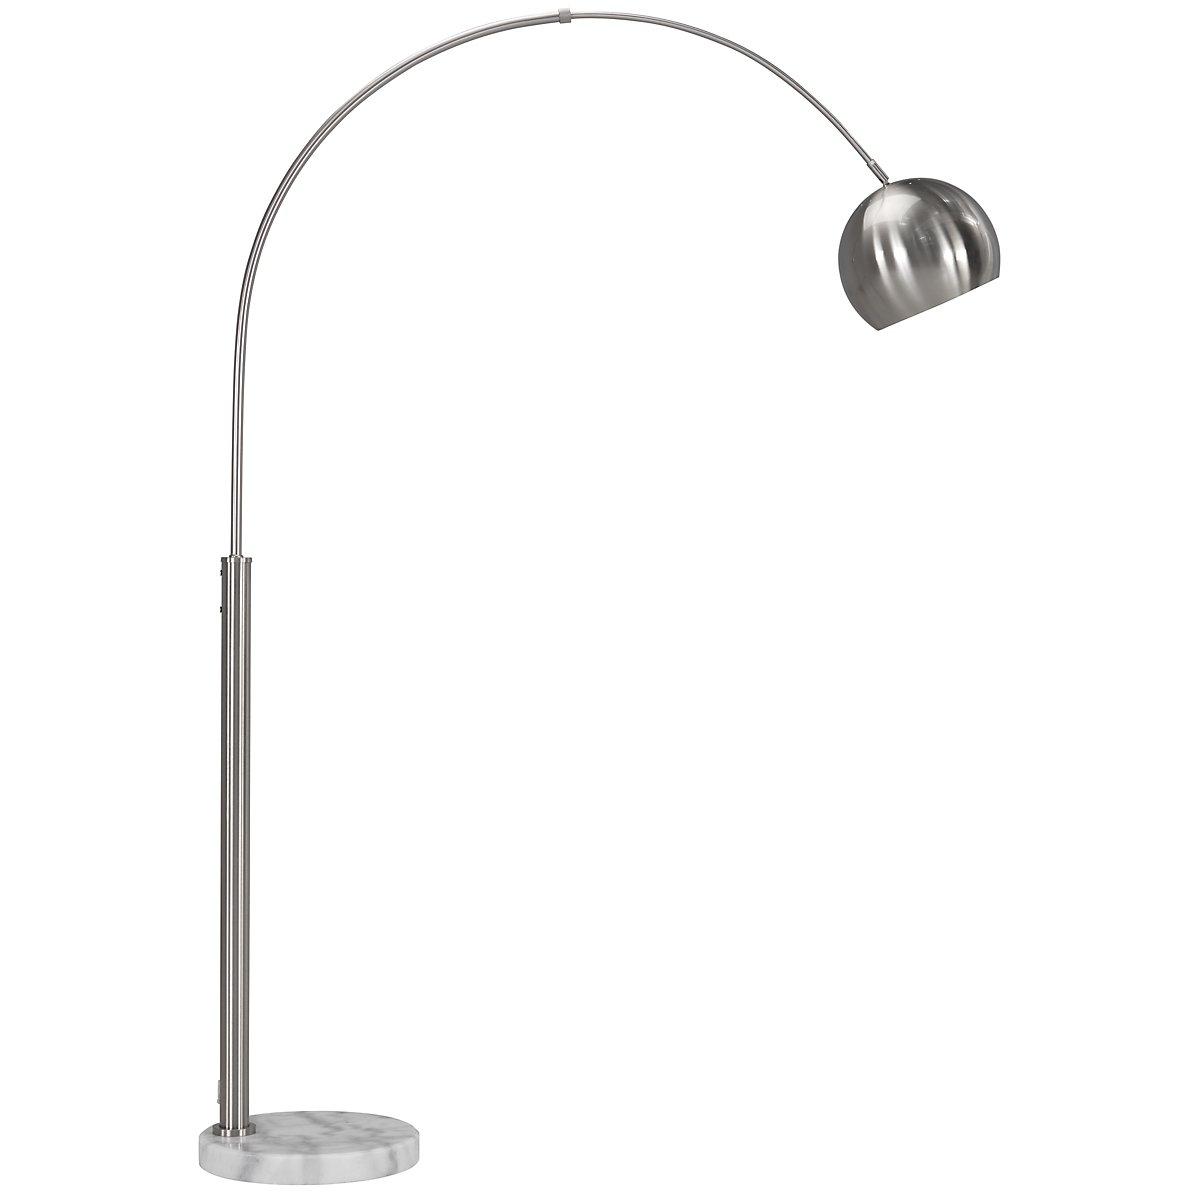 Basque Silver Arc Floor Lamp